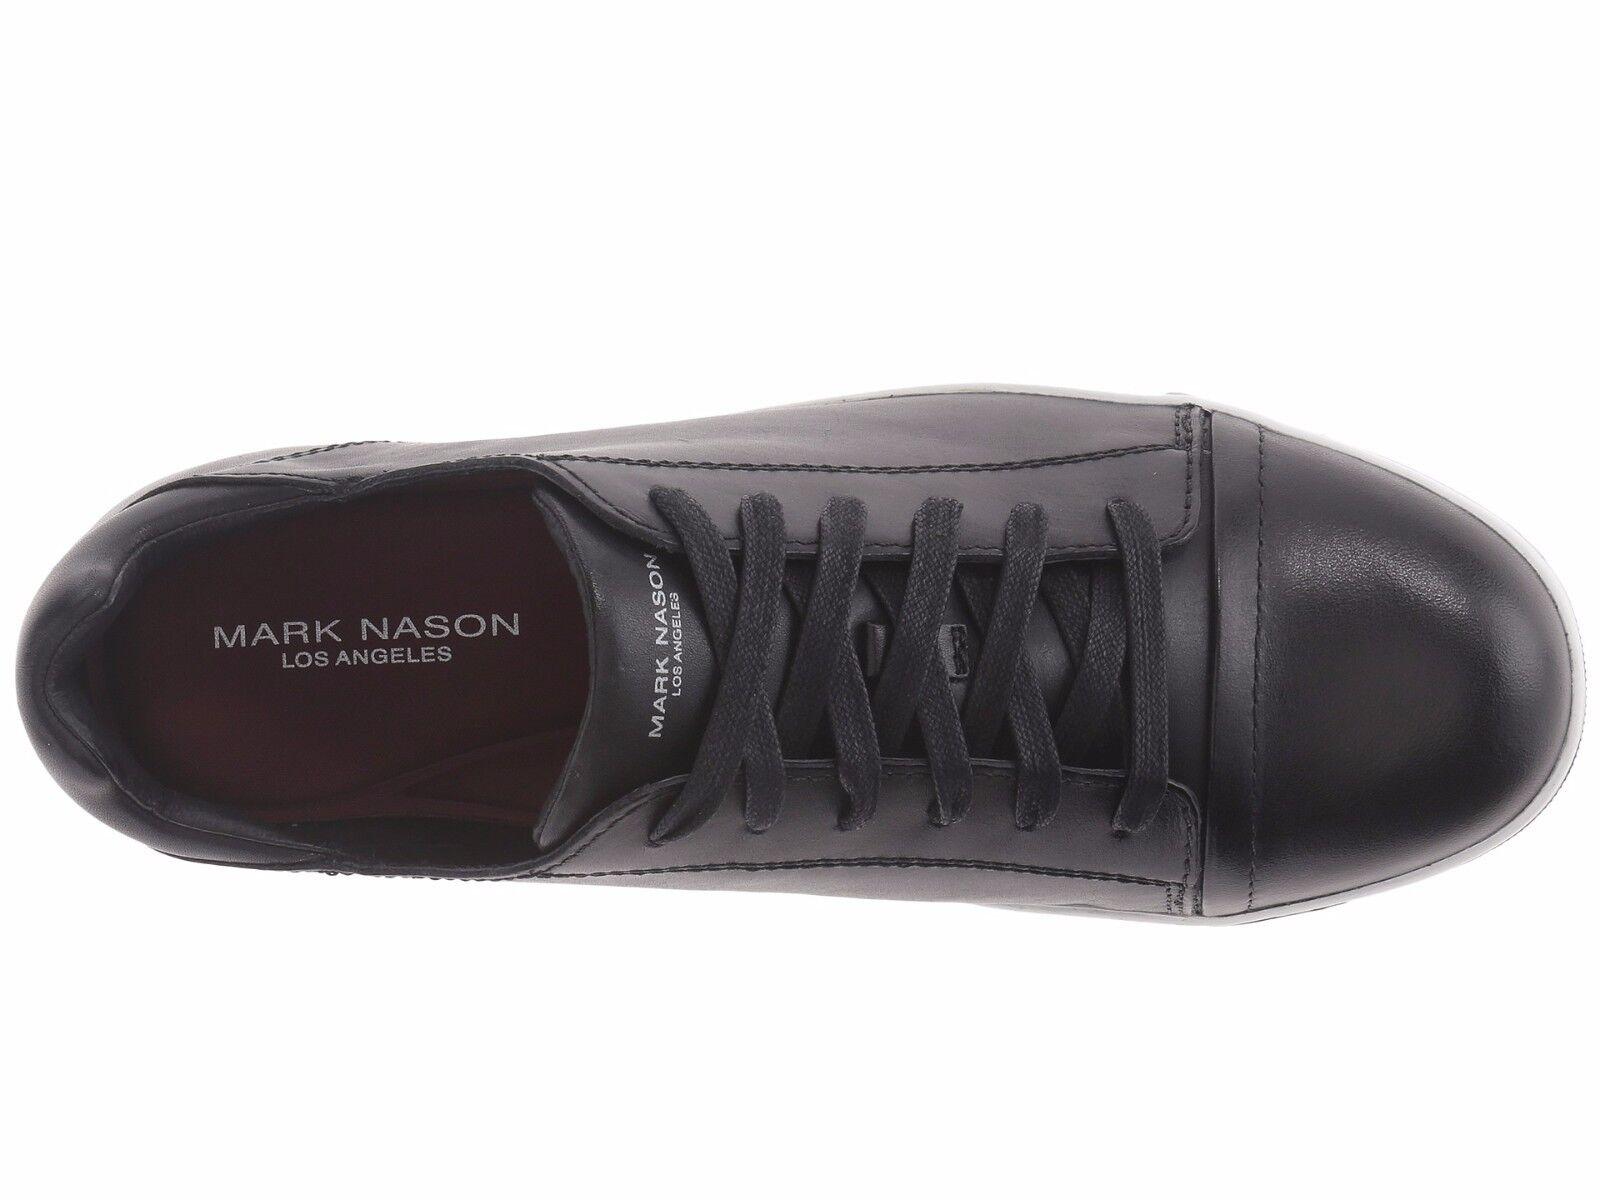 NIB Mark Nason Men Shaver Schuhes Navy Leder Oxfords Casual Schuhes Shaver sz 9M 04af97